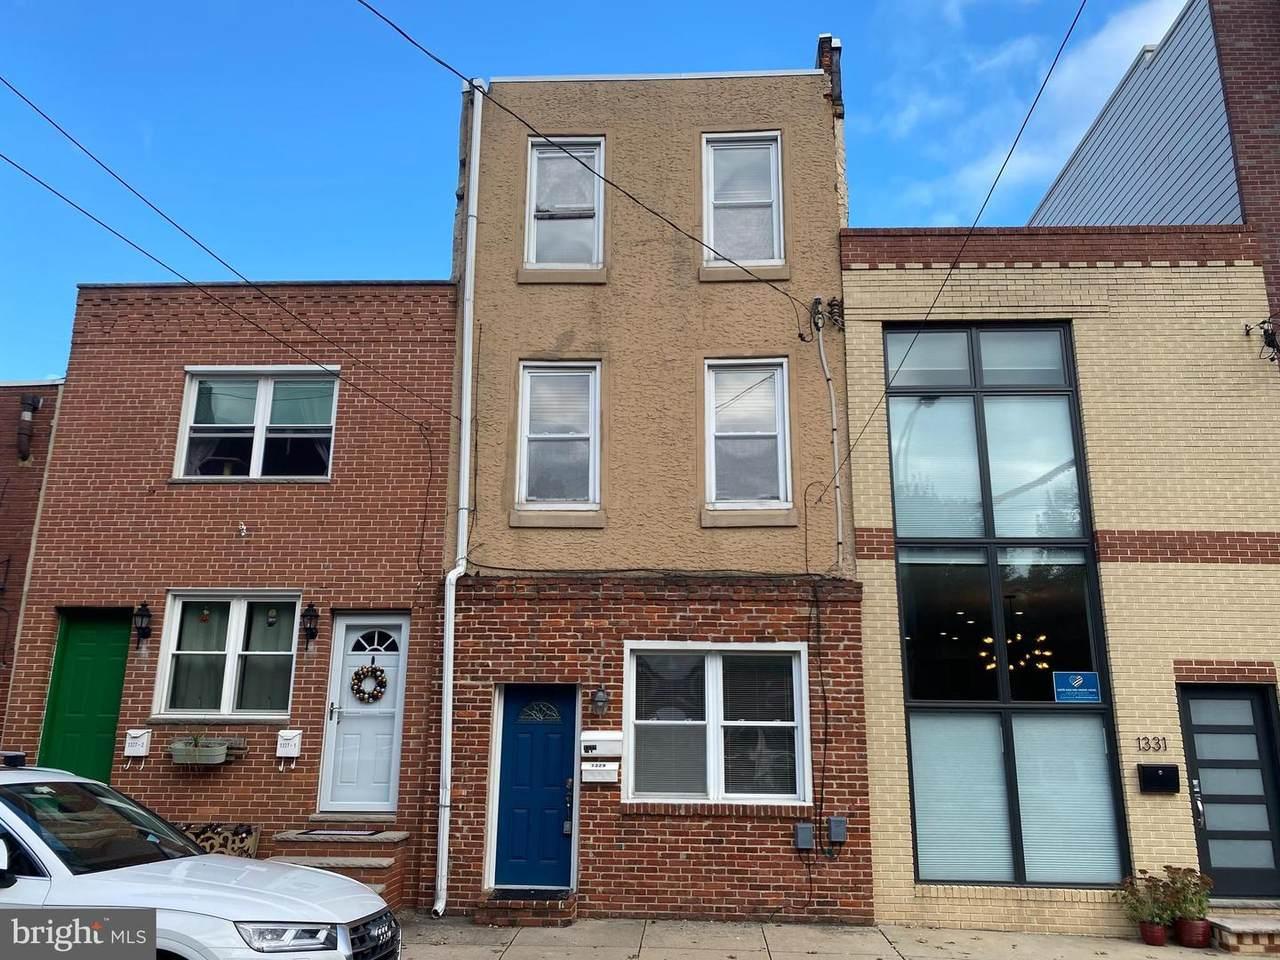 1329 2ND Street - Photo 1